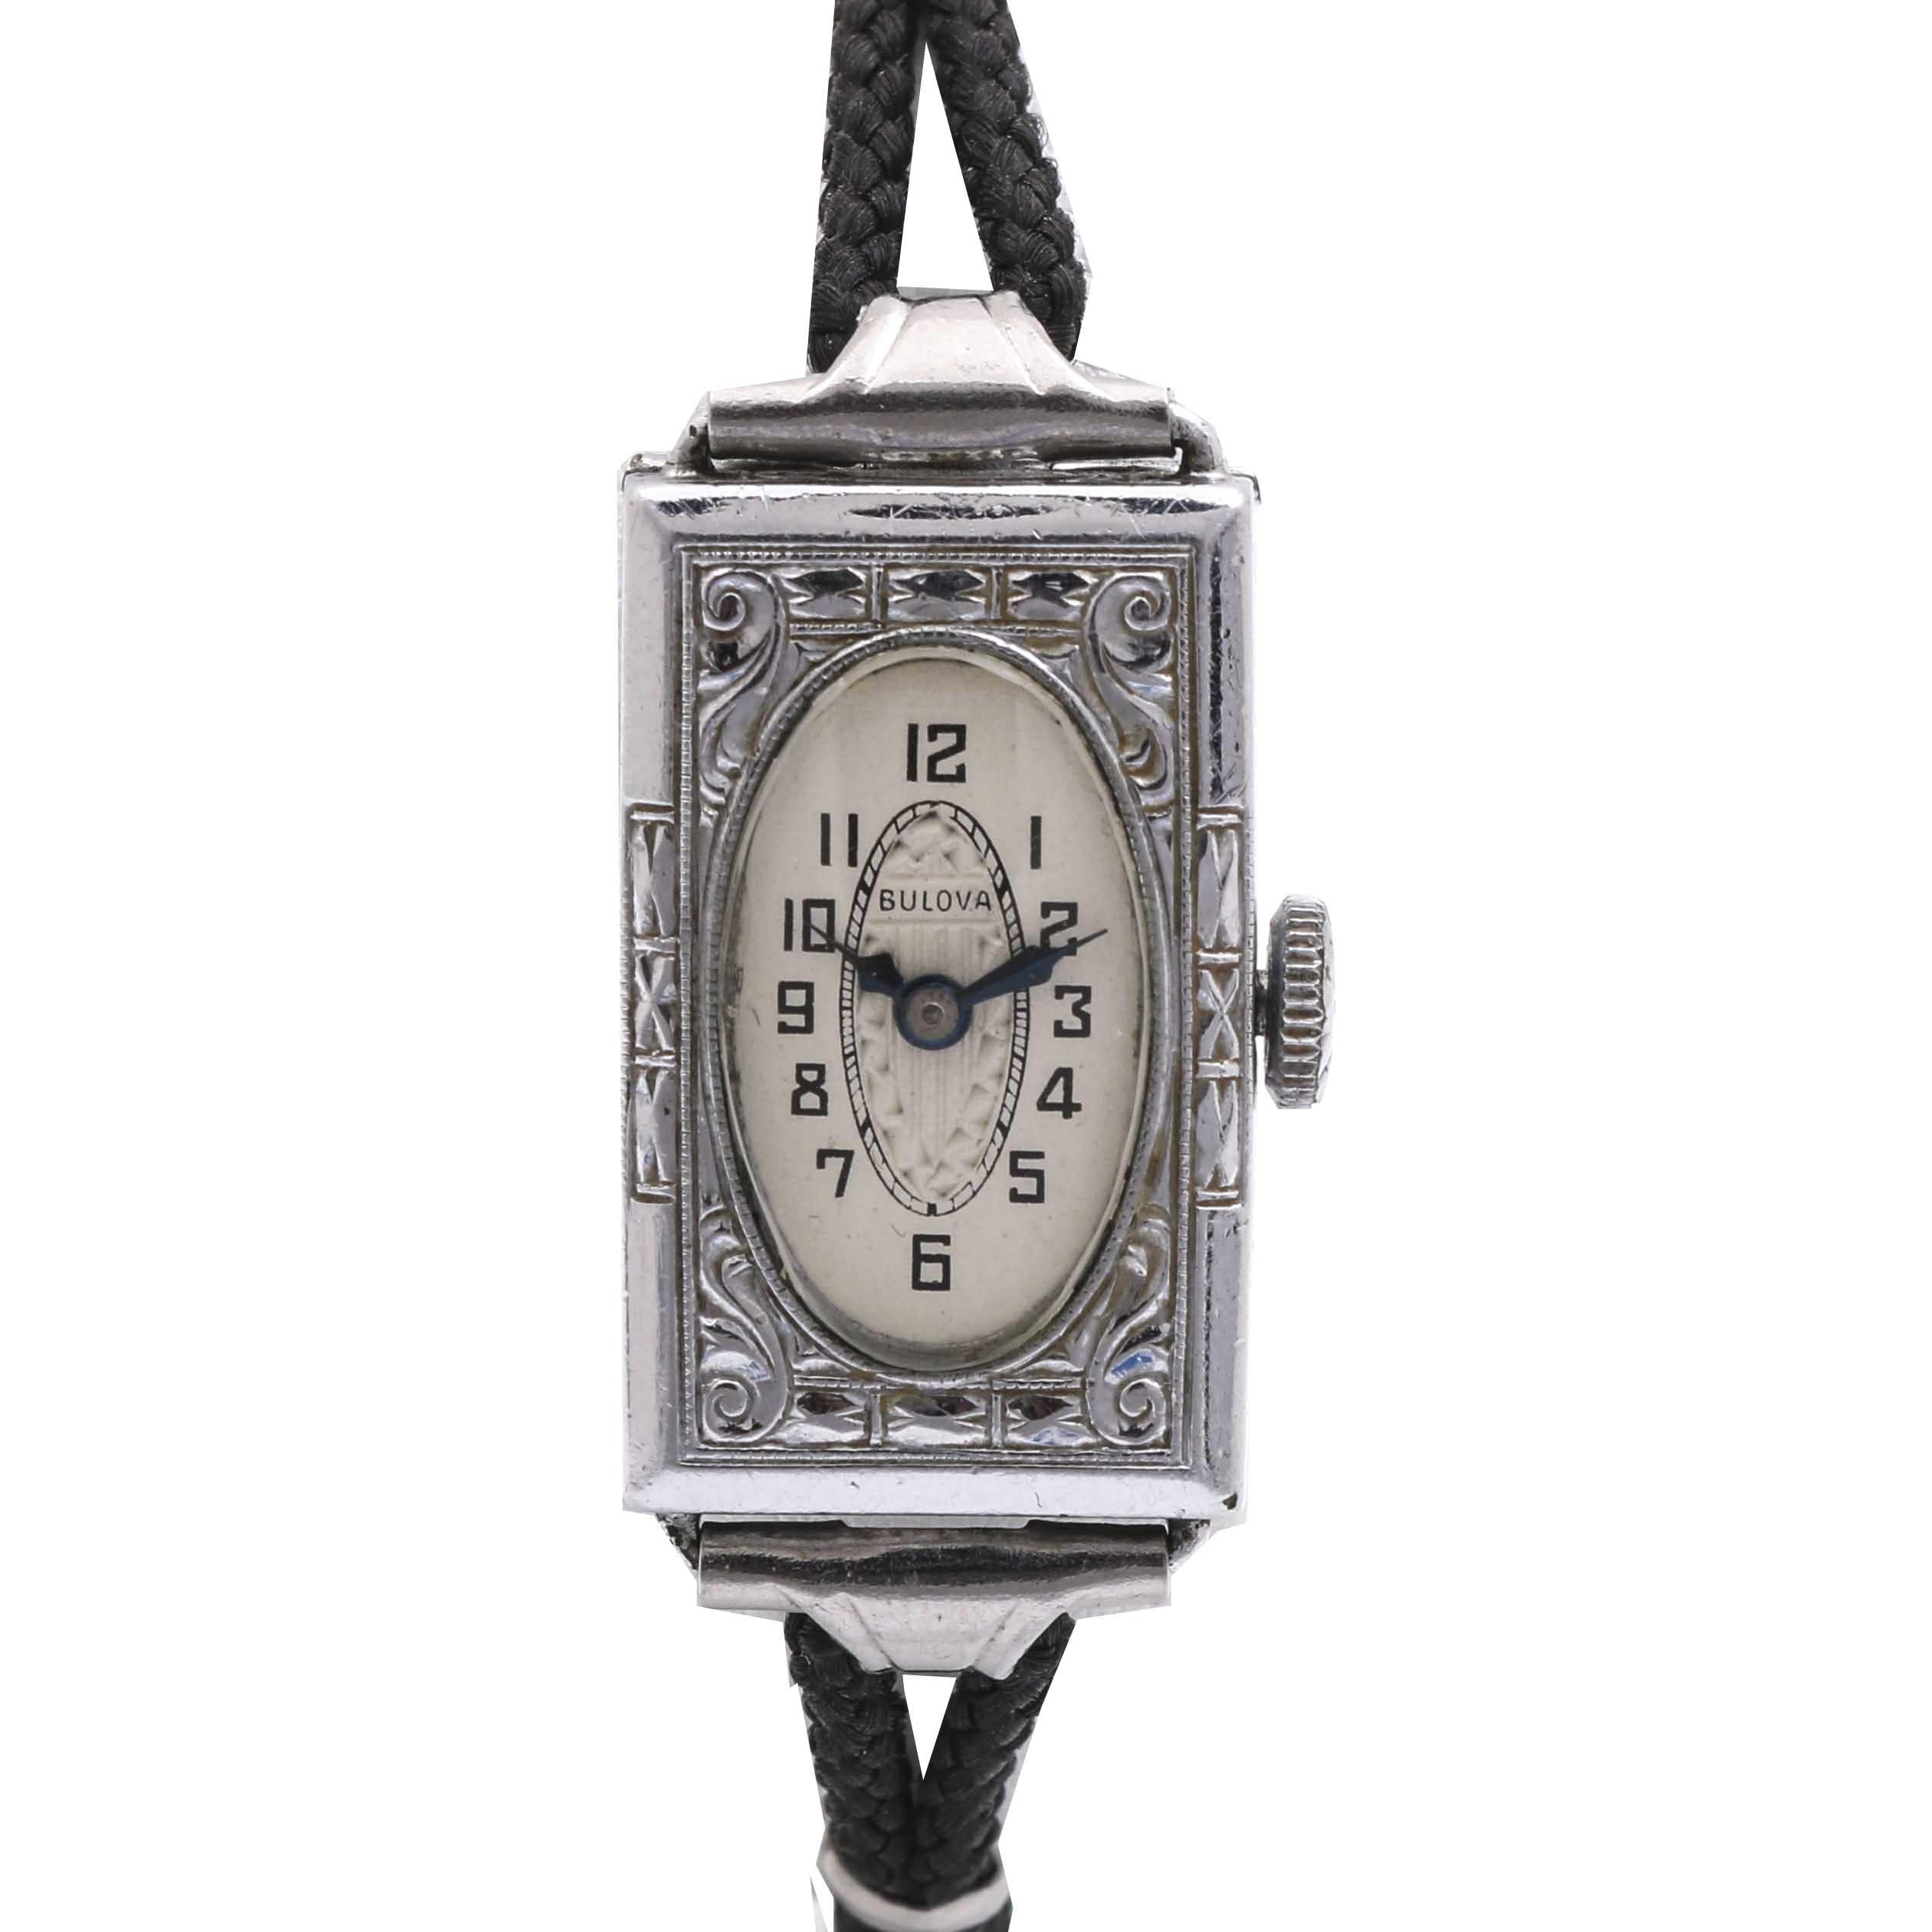 Bulova 14K White Gold Filled and Black Cord Wristwatch